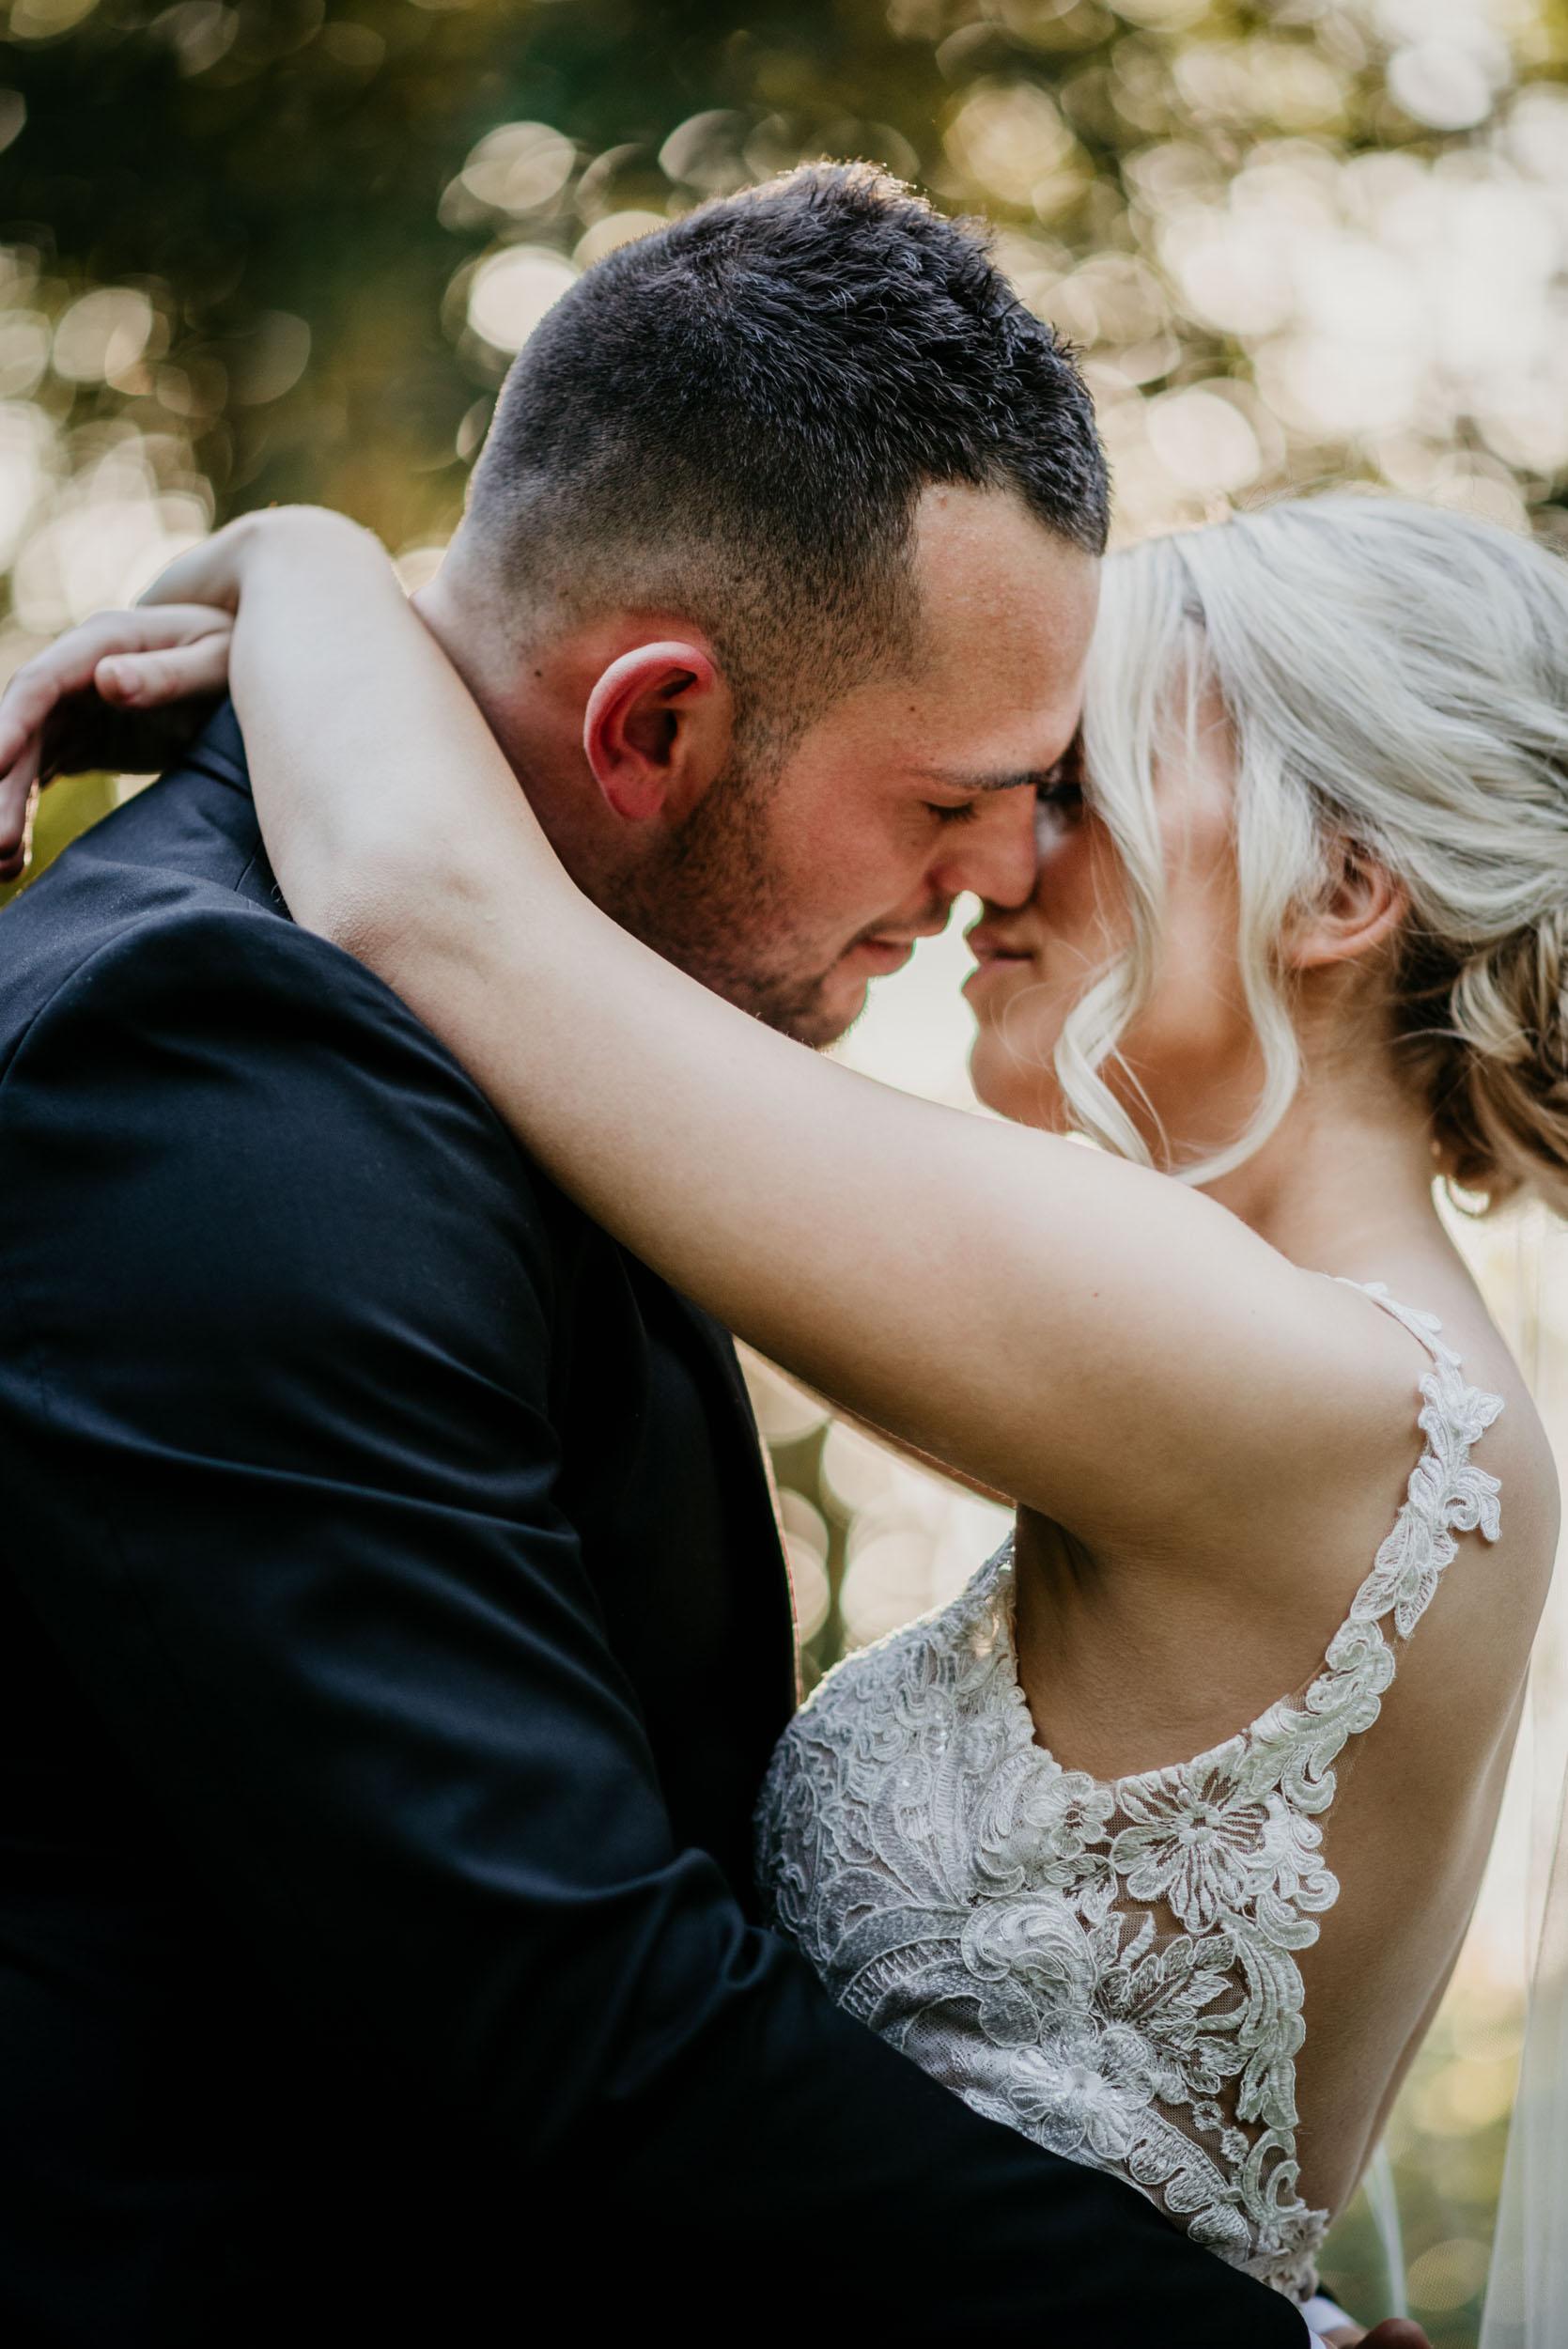 The Raw Photographer - Cairns Wedding Photographer - Laloli - Cairns Garden Wedding - Bride Dress - Destination Wed - Outdoor Reception - Queensland Ceremony-46.jpg